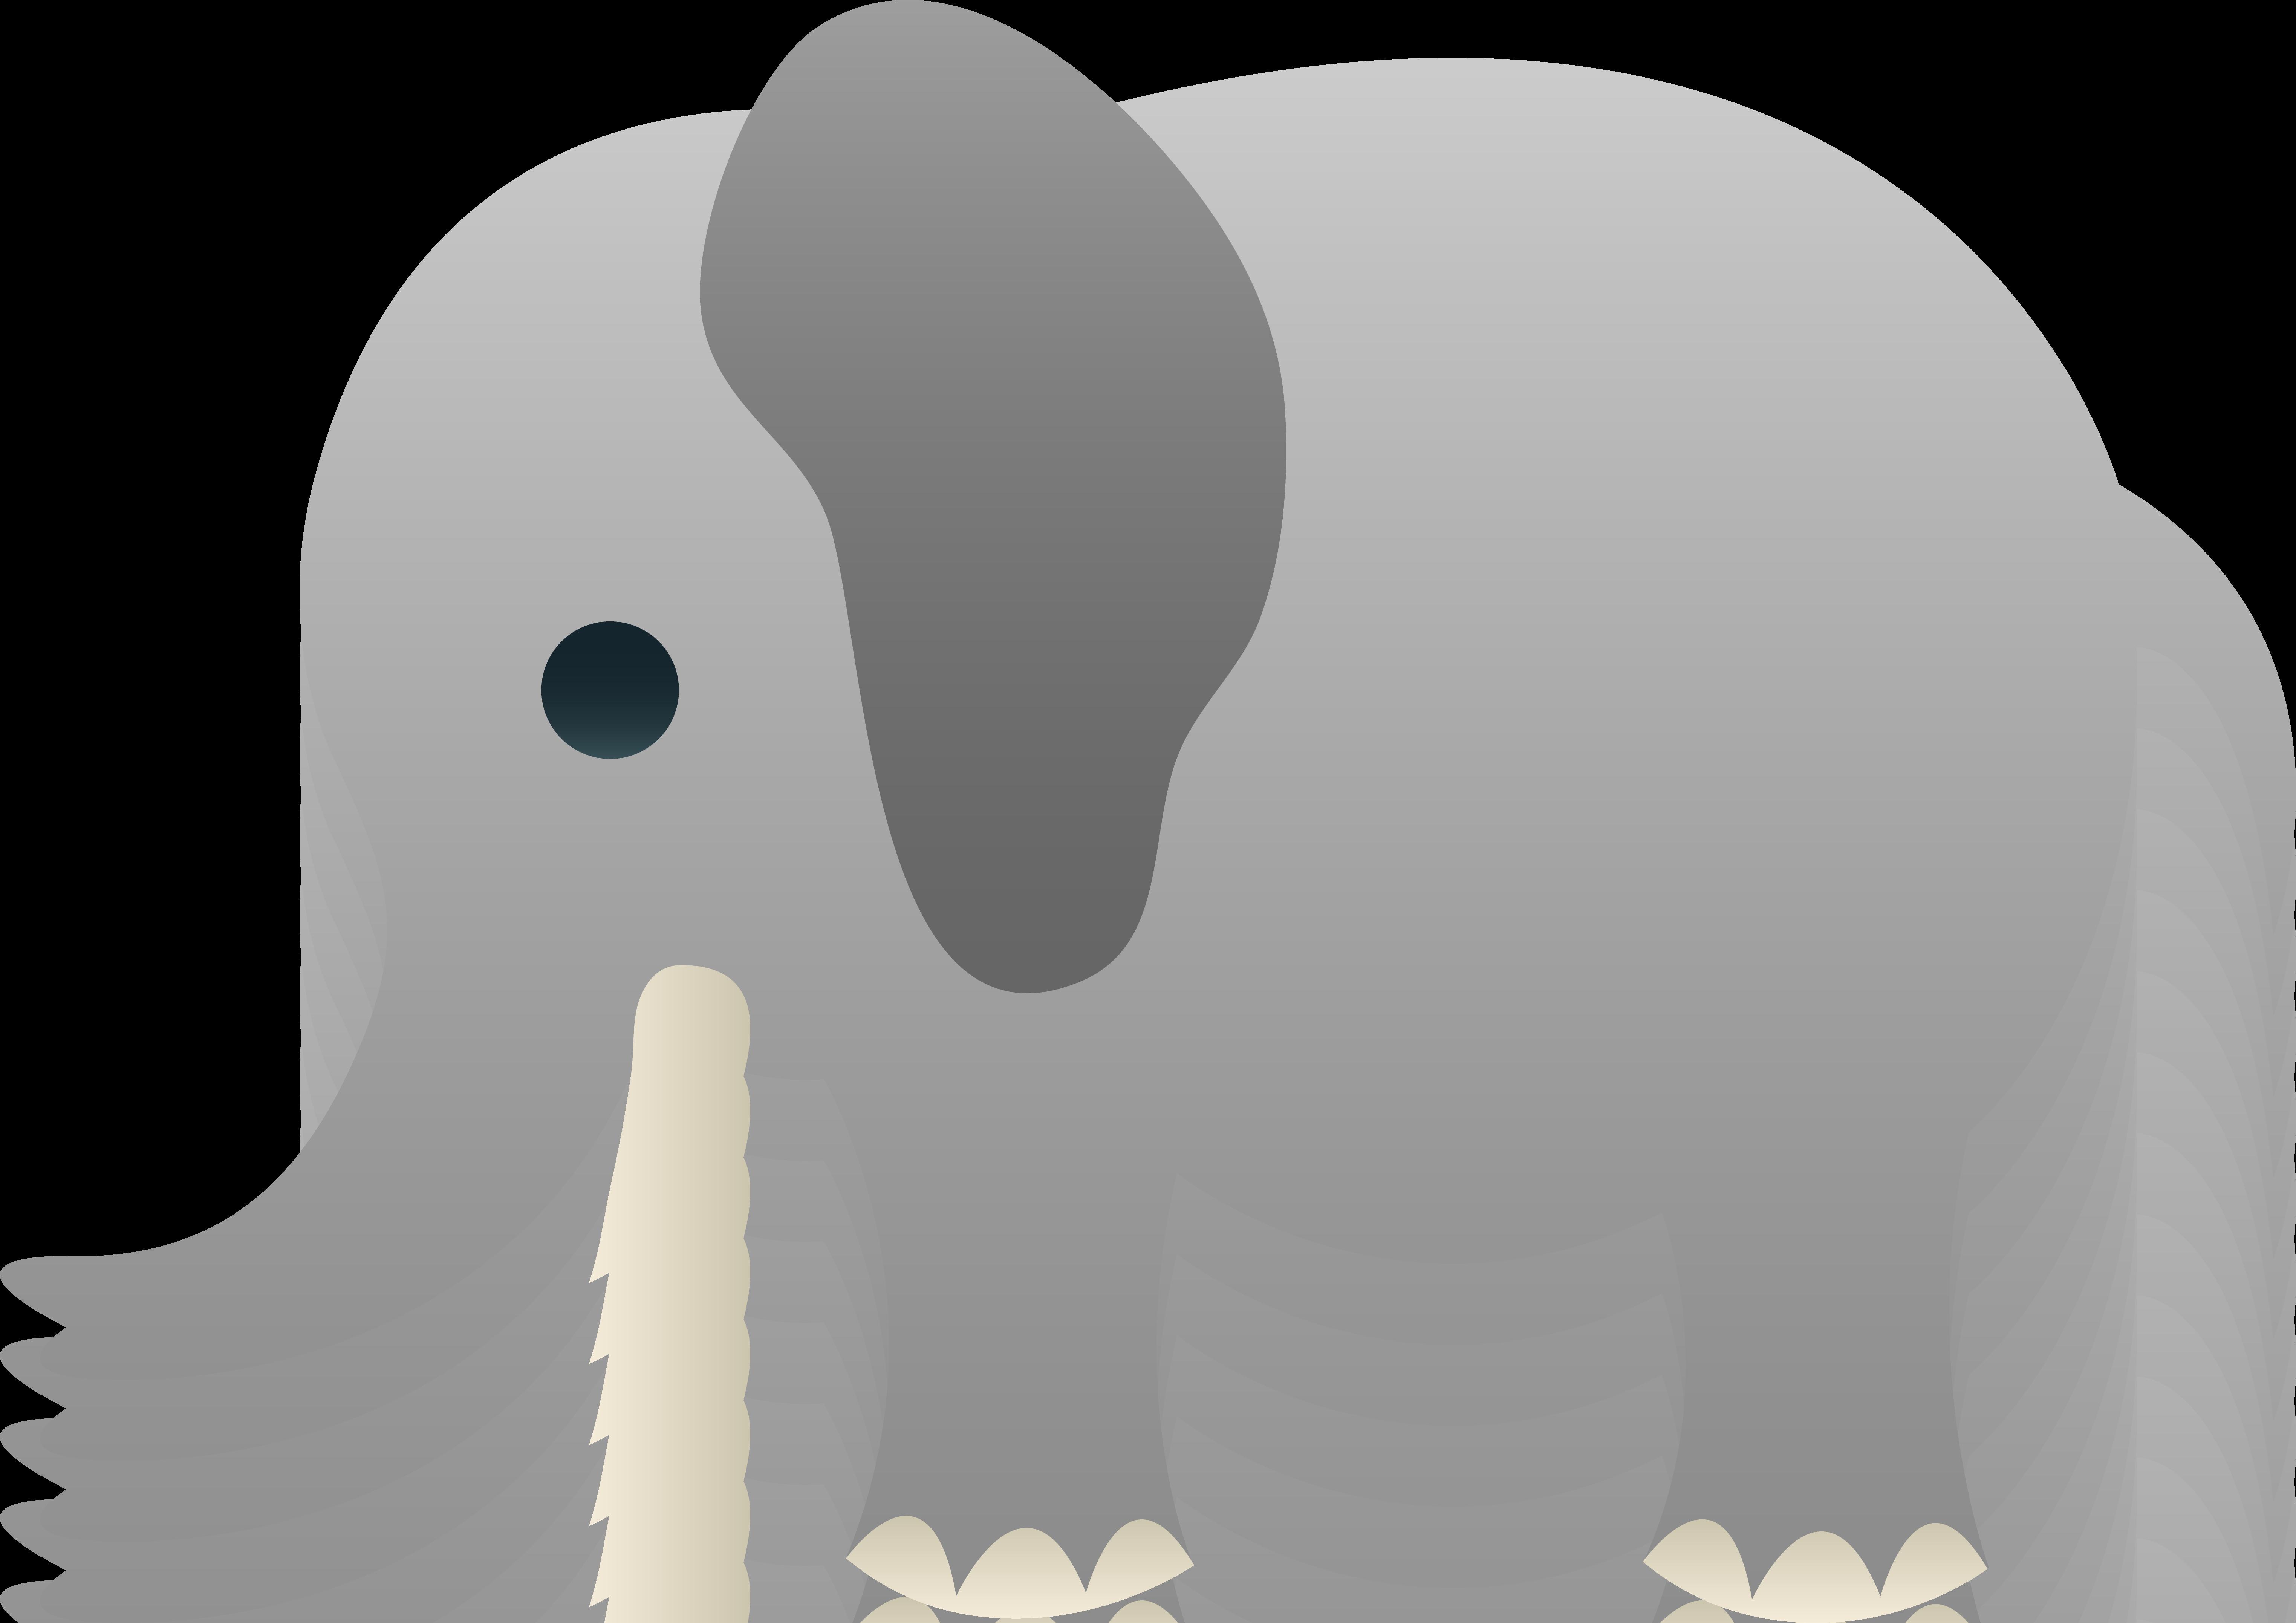 Grey elephant clipart clip art freeuse download Little Gray Elephant Clip Art - Free Clip Art clip art freeuse download